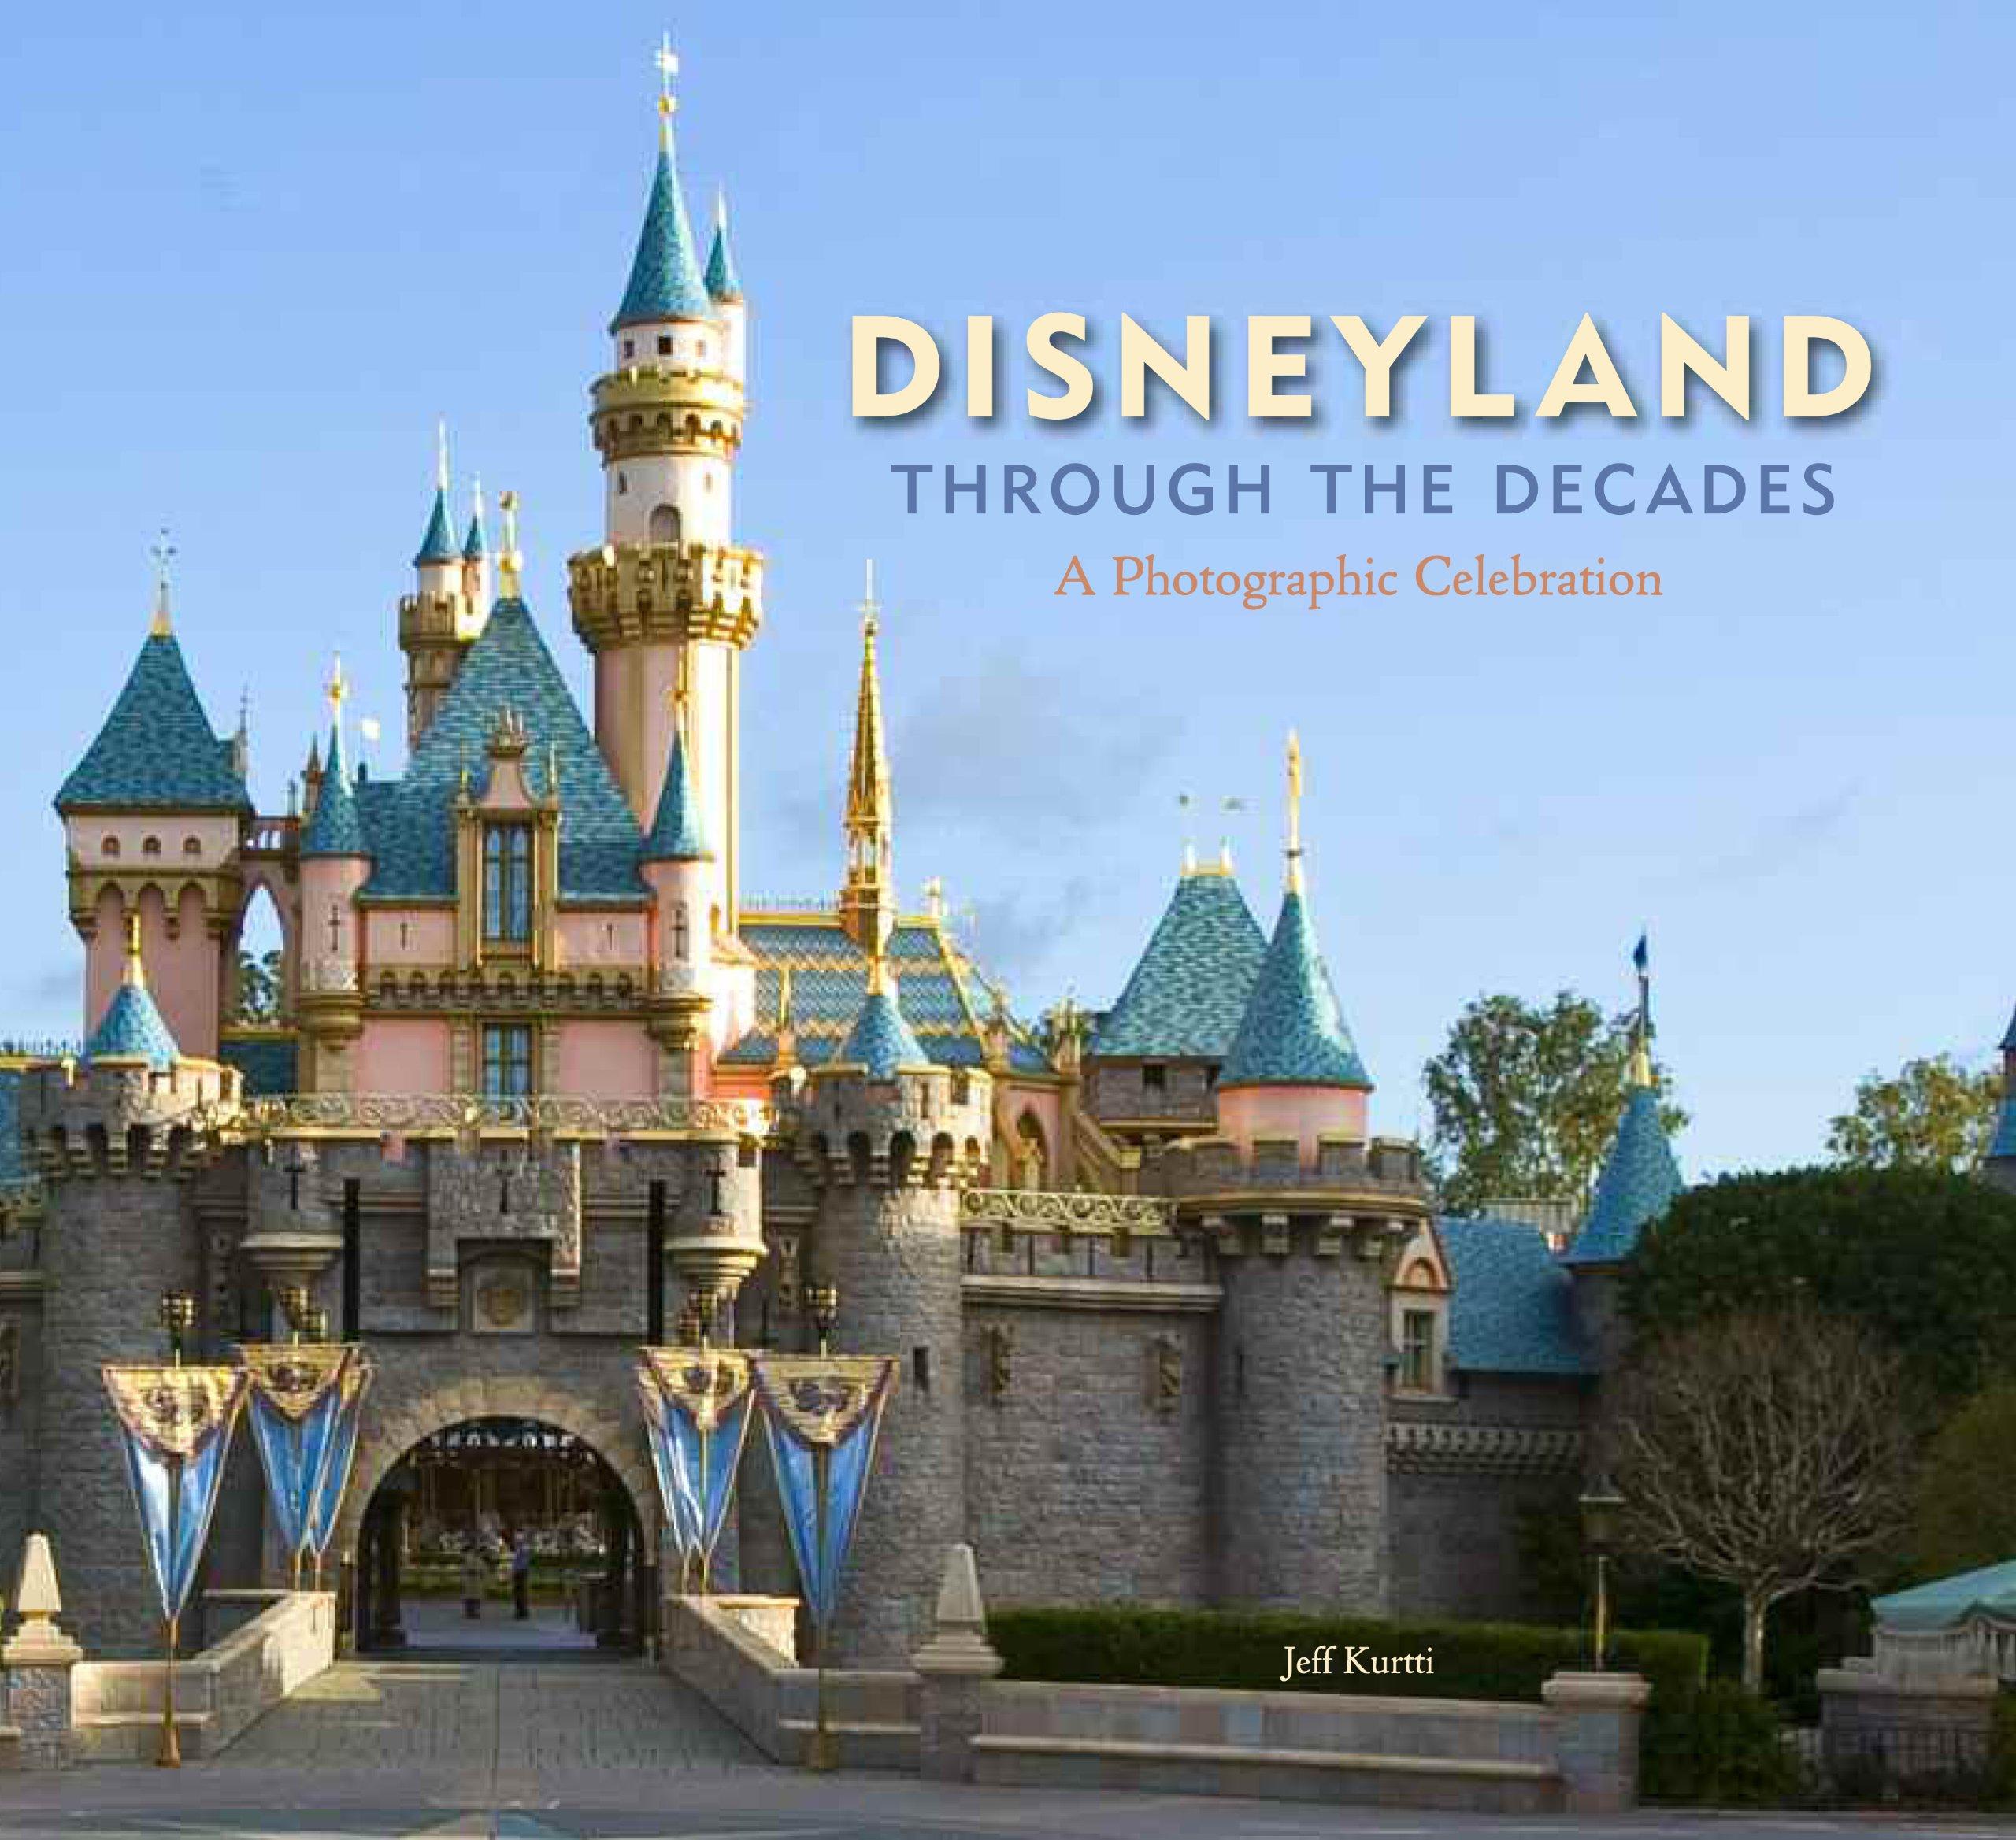 File:Disneyland Through the Decades.jpg